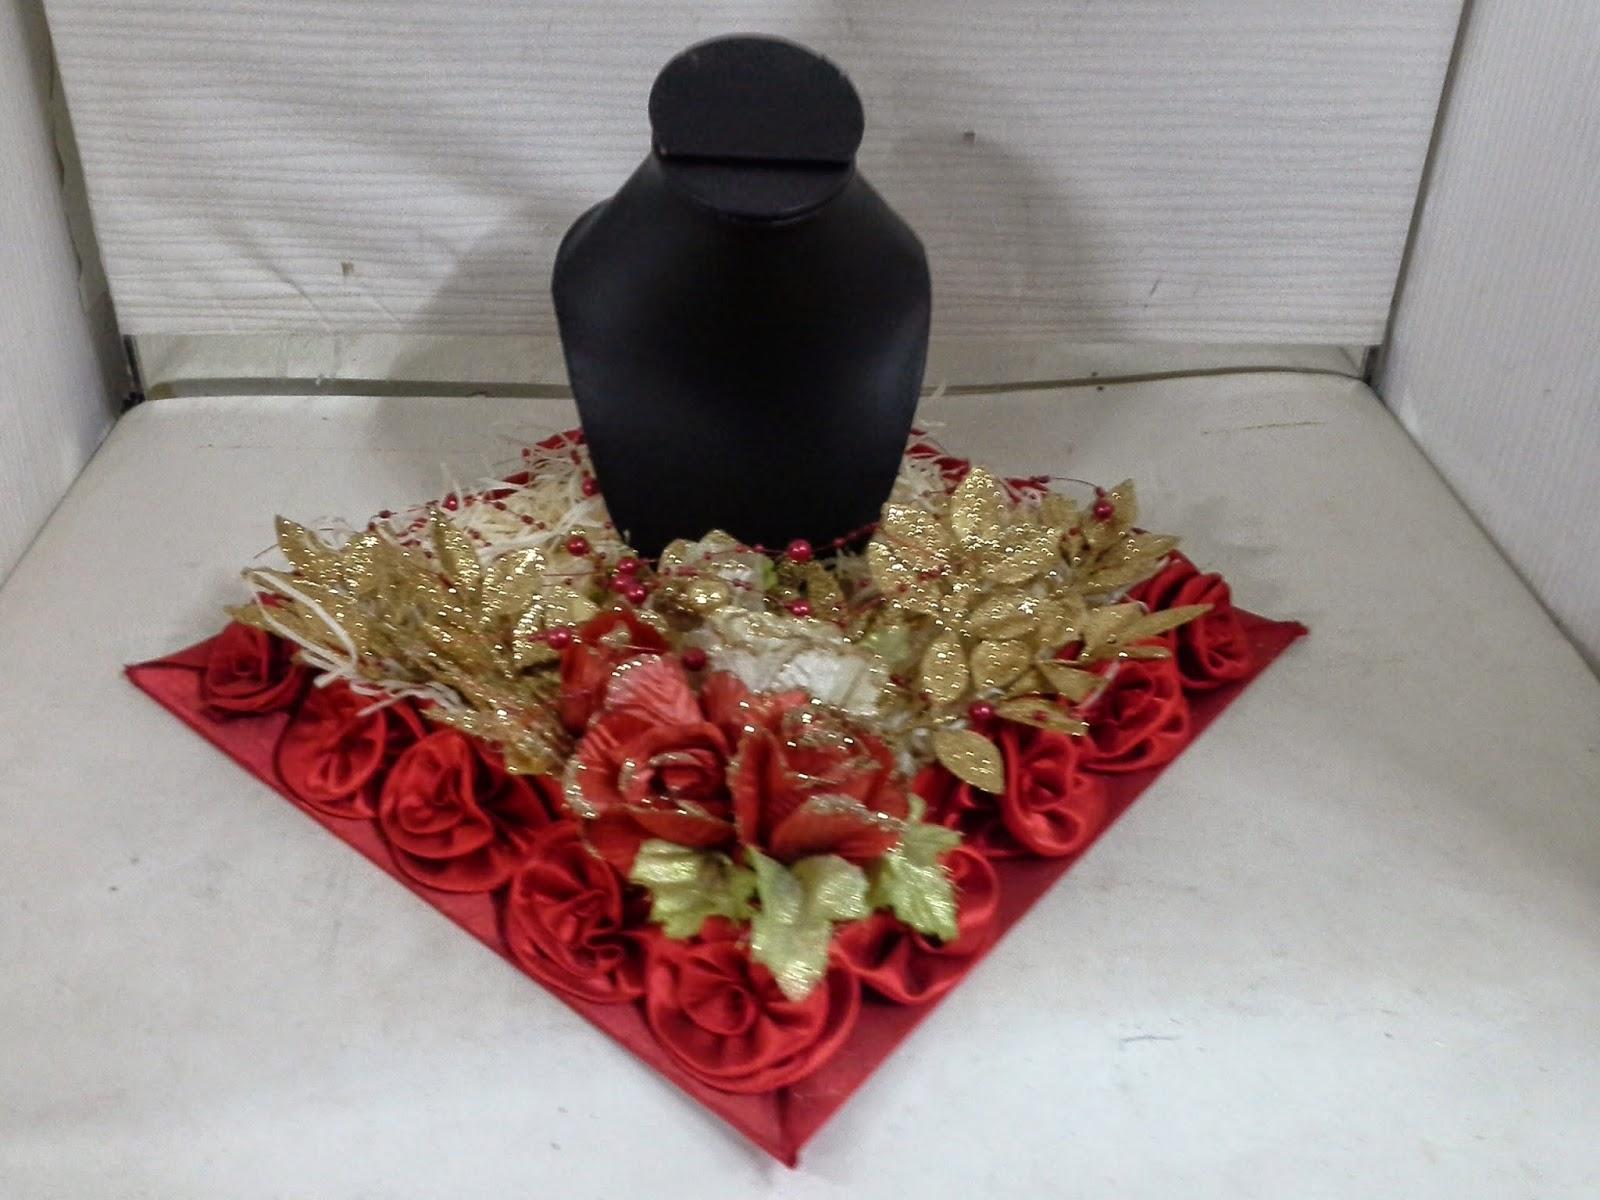 Indian Wedding Gifts Ideas: Jewellery Packaging Trays, Jewellery Presentation